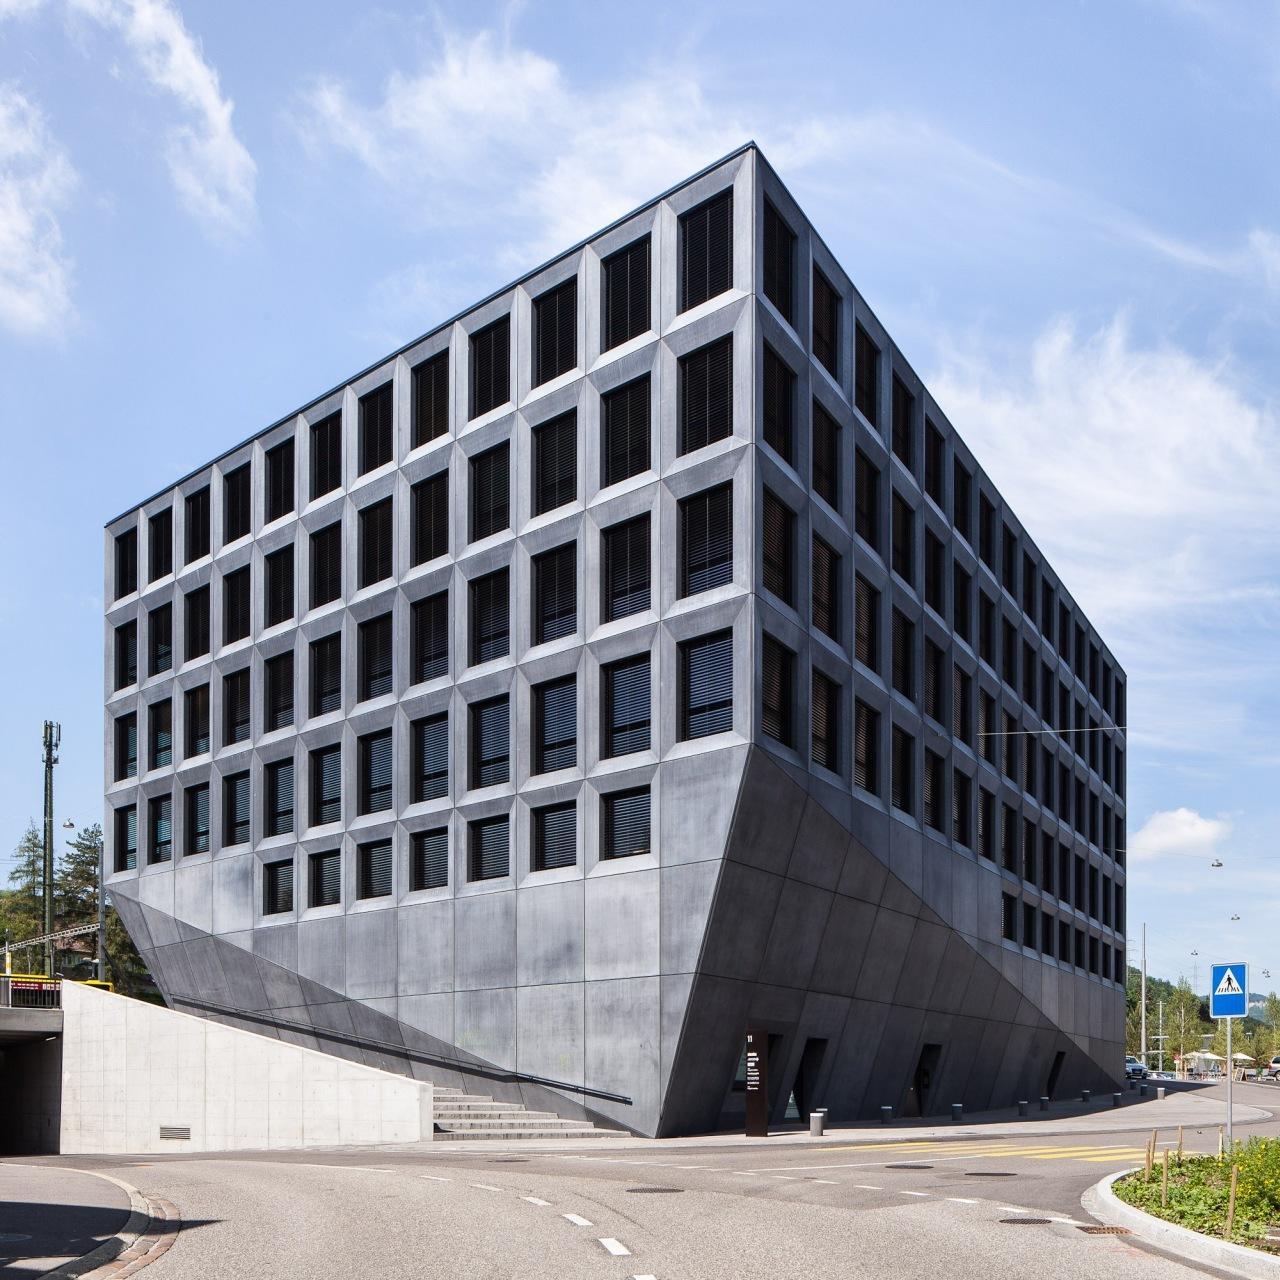 A f a s i a 63 christ gantenbein Building facade pictures